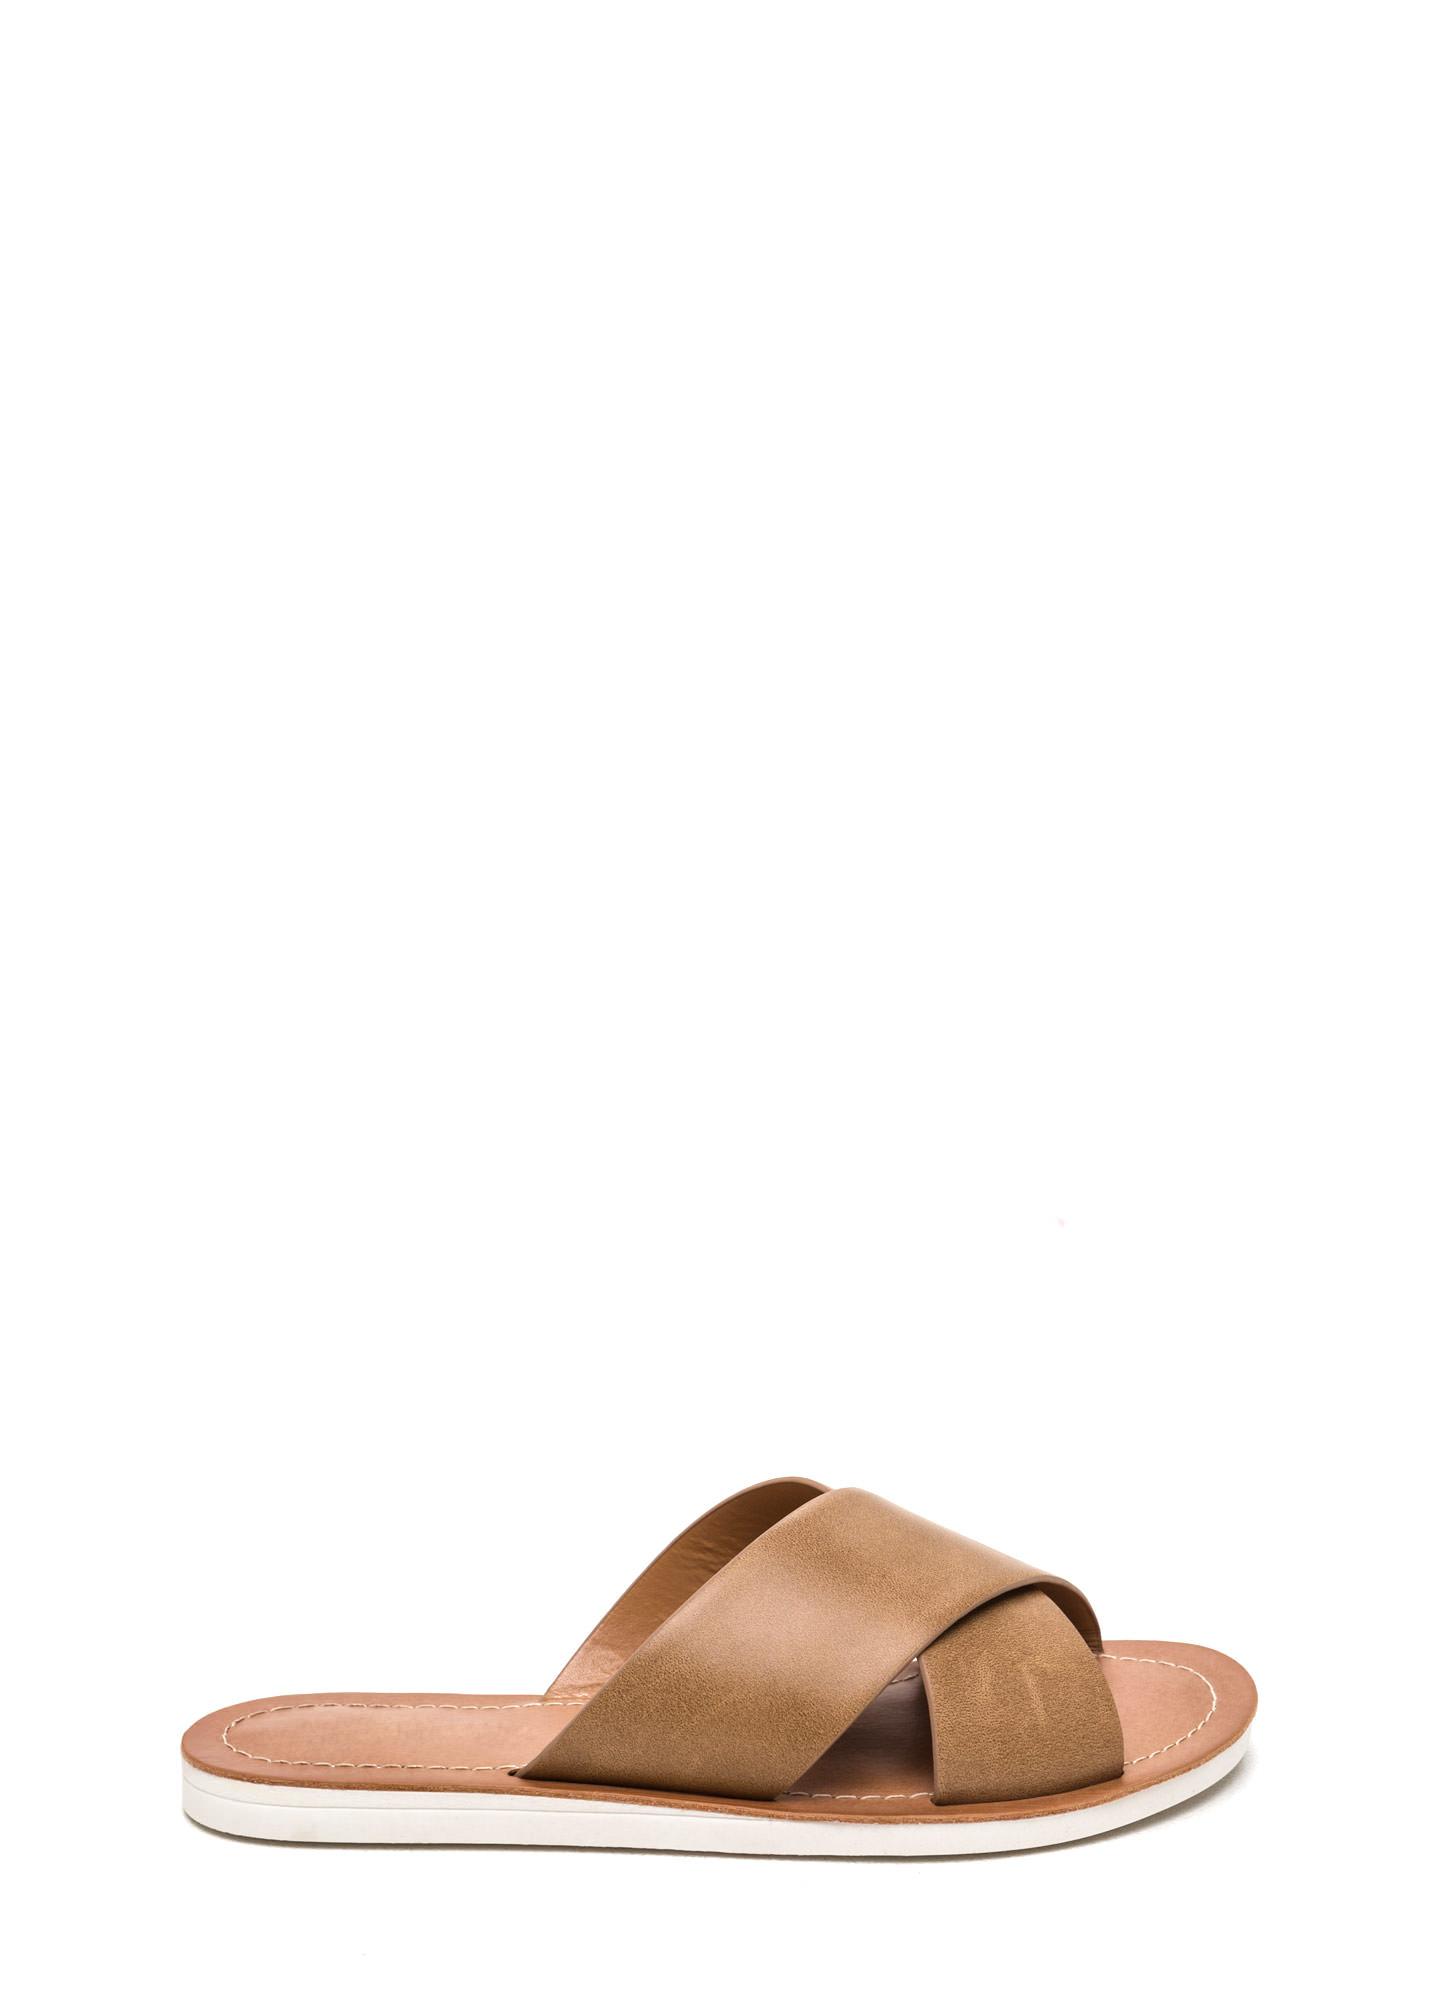 11e2d83609d5 X Marks The Spot Slide Sandals CAMEL TAN BLACK - GoJane.com